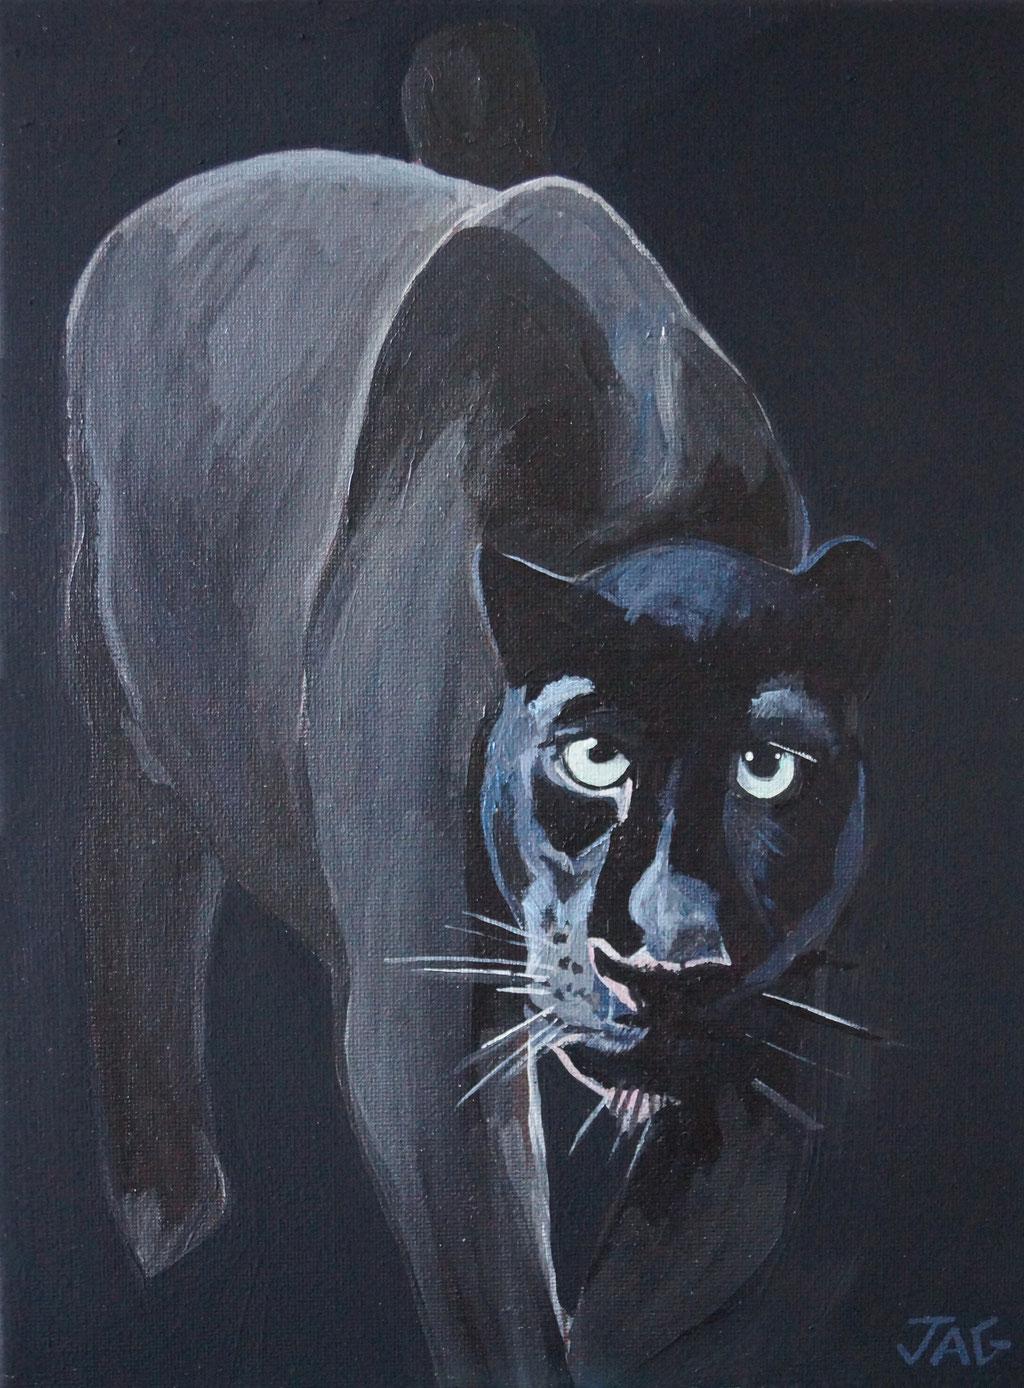 'Chadwick' acrylic on canvas, 2020,  23 x 31cm - price on request